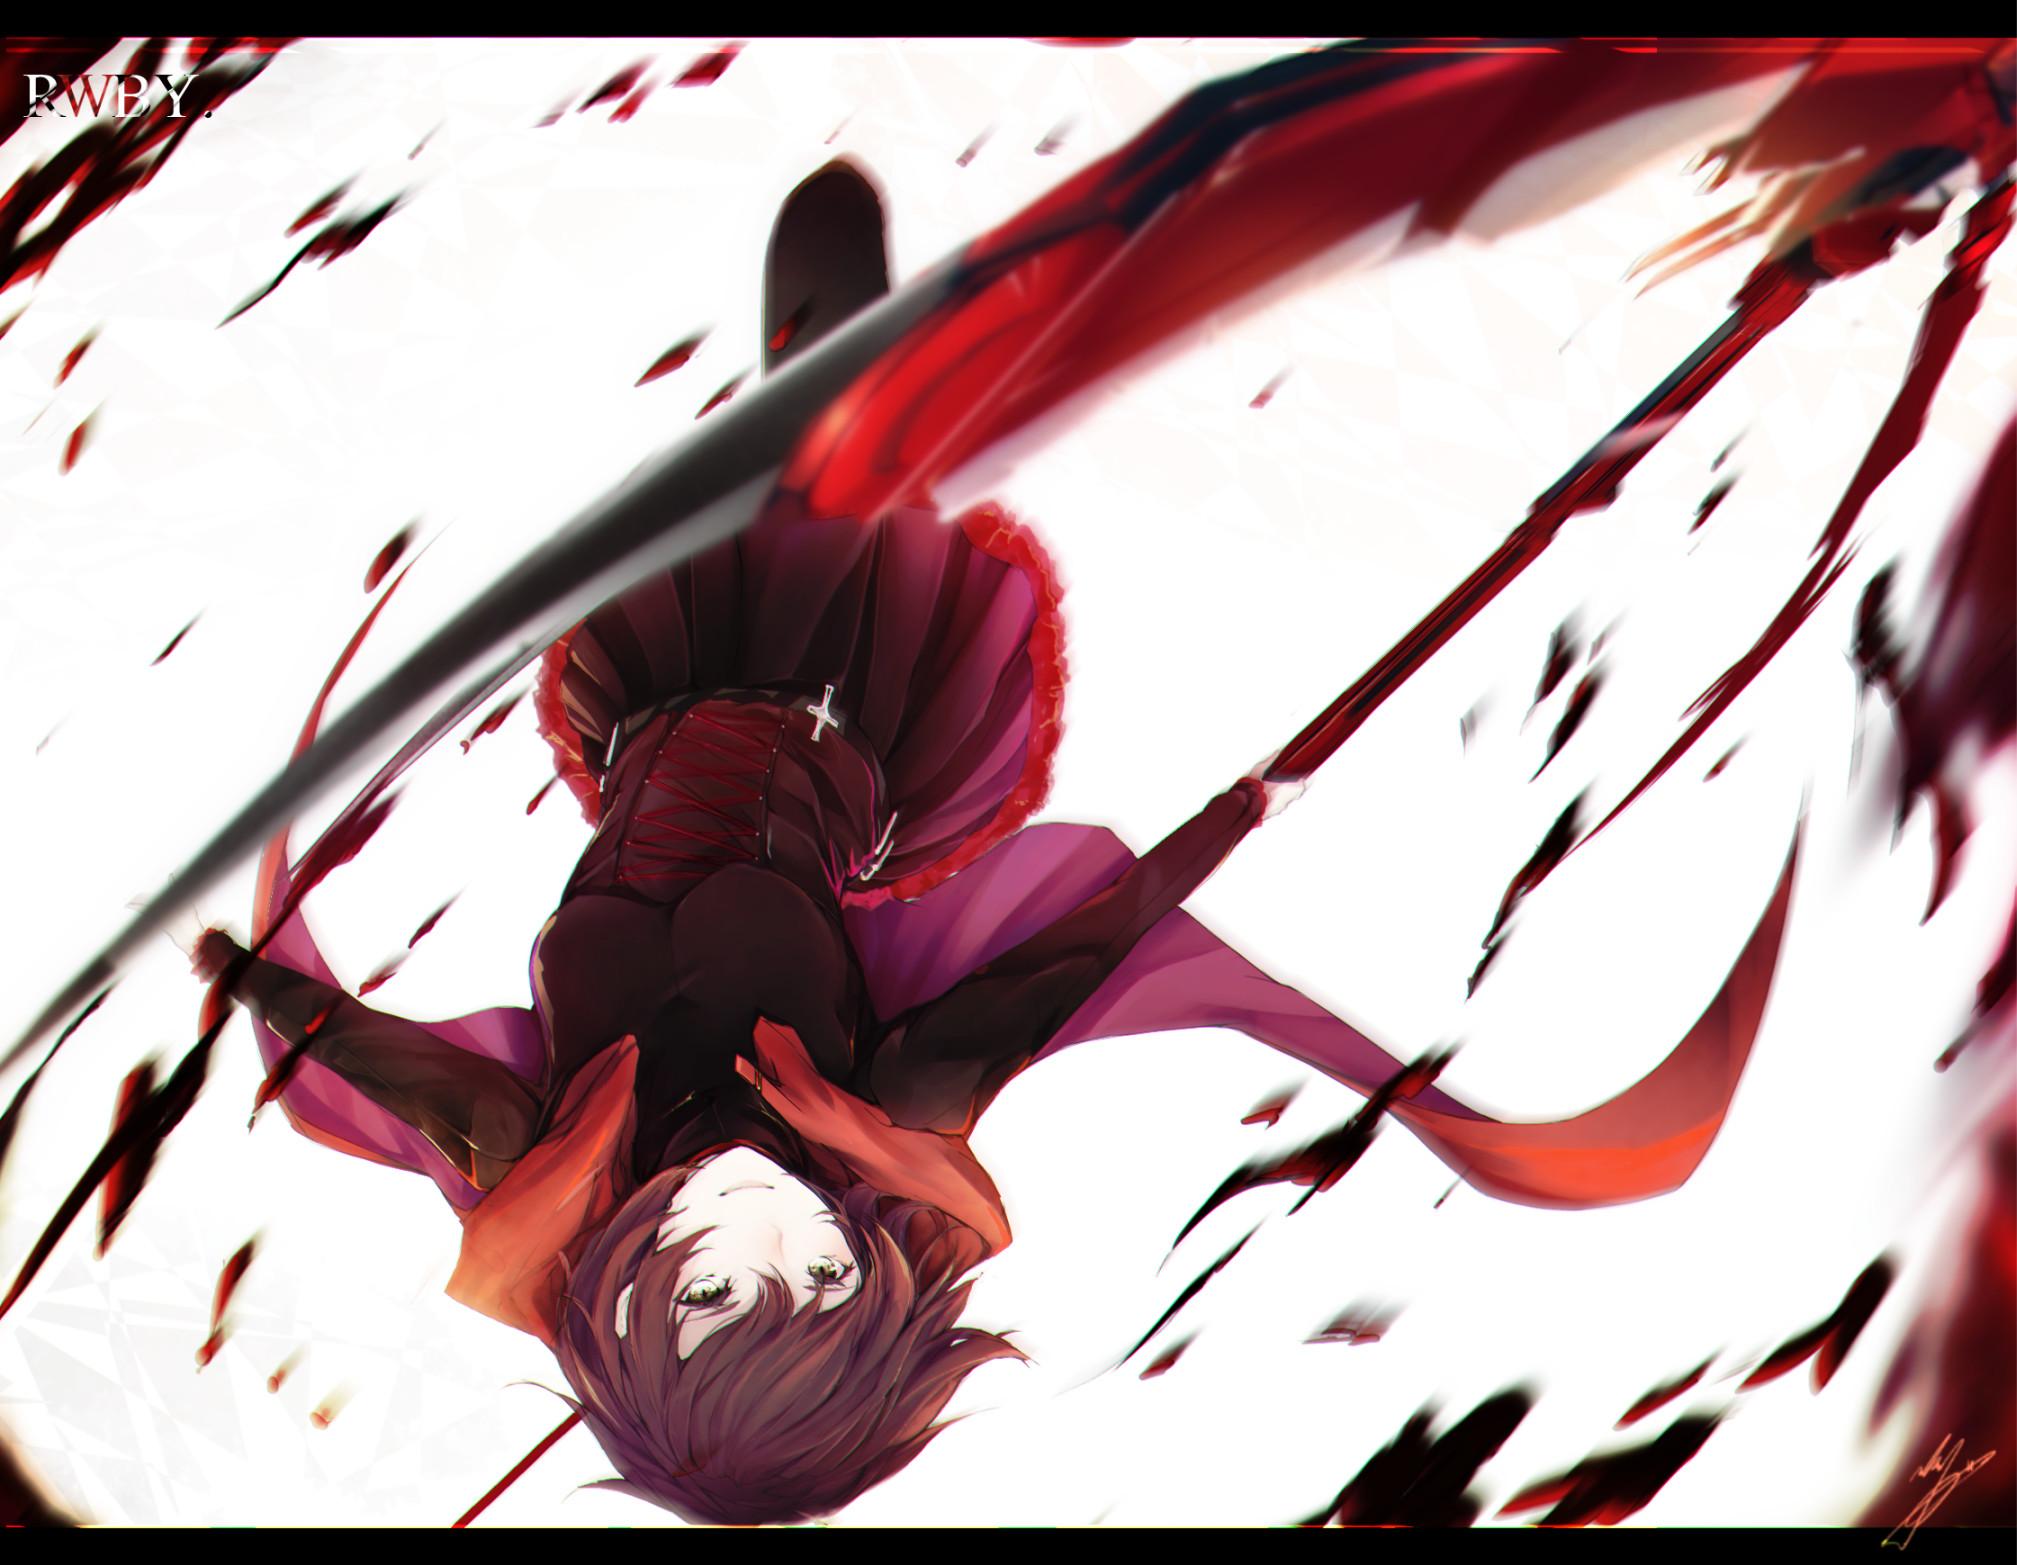 Anime – RWBY Ruby Rose (RWBY) Wallpaper